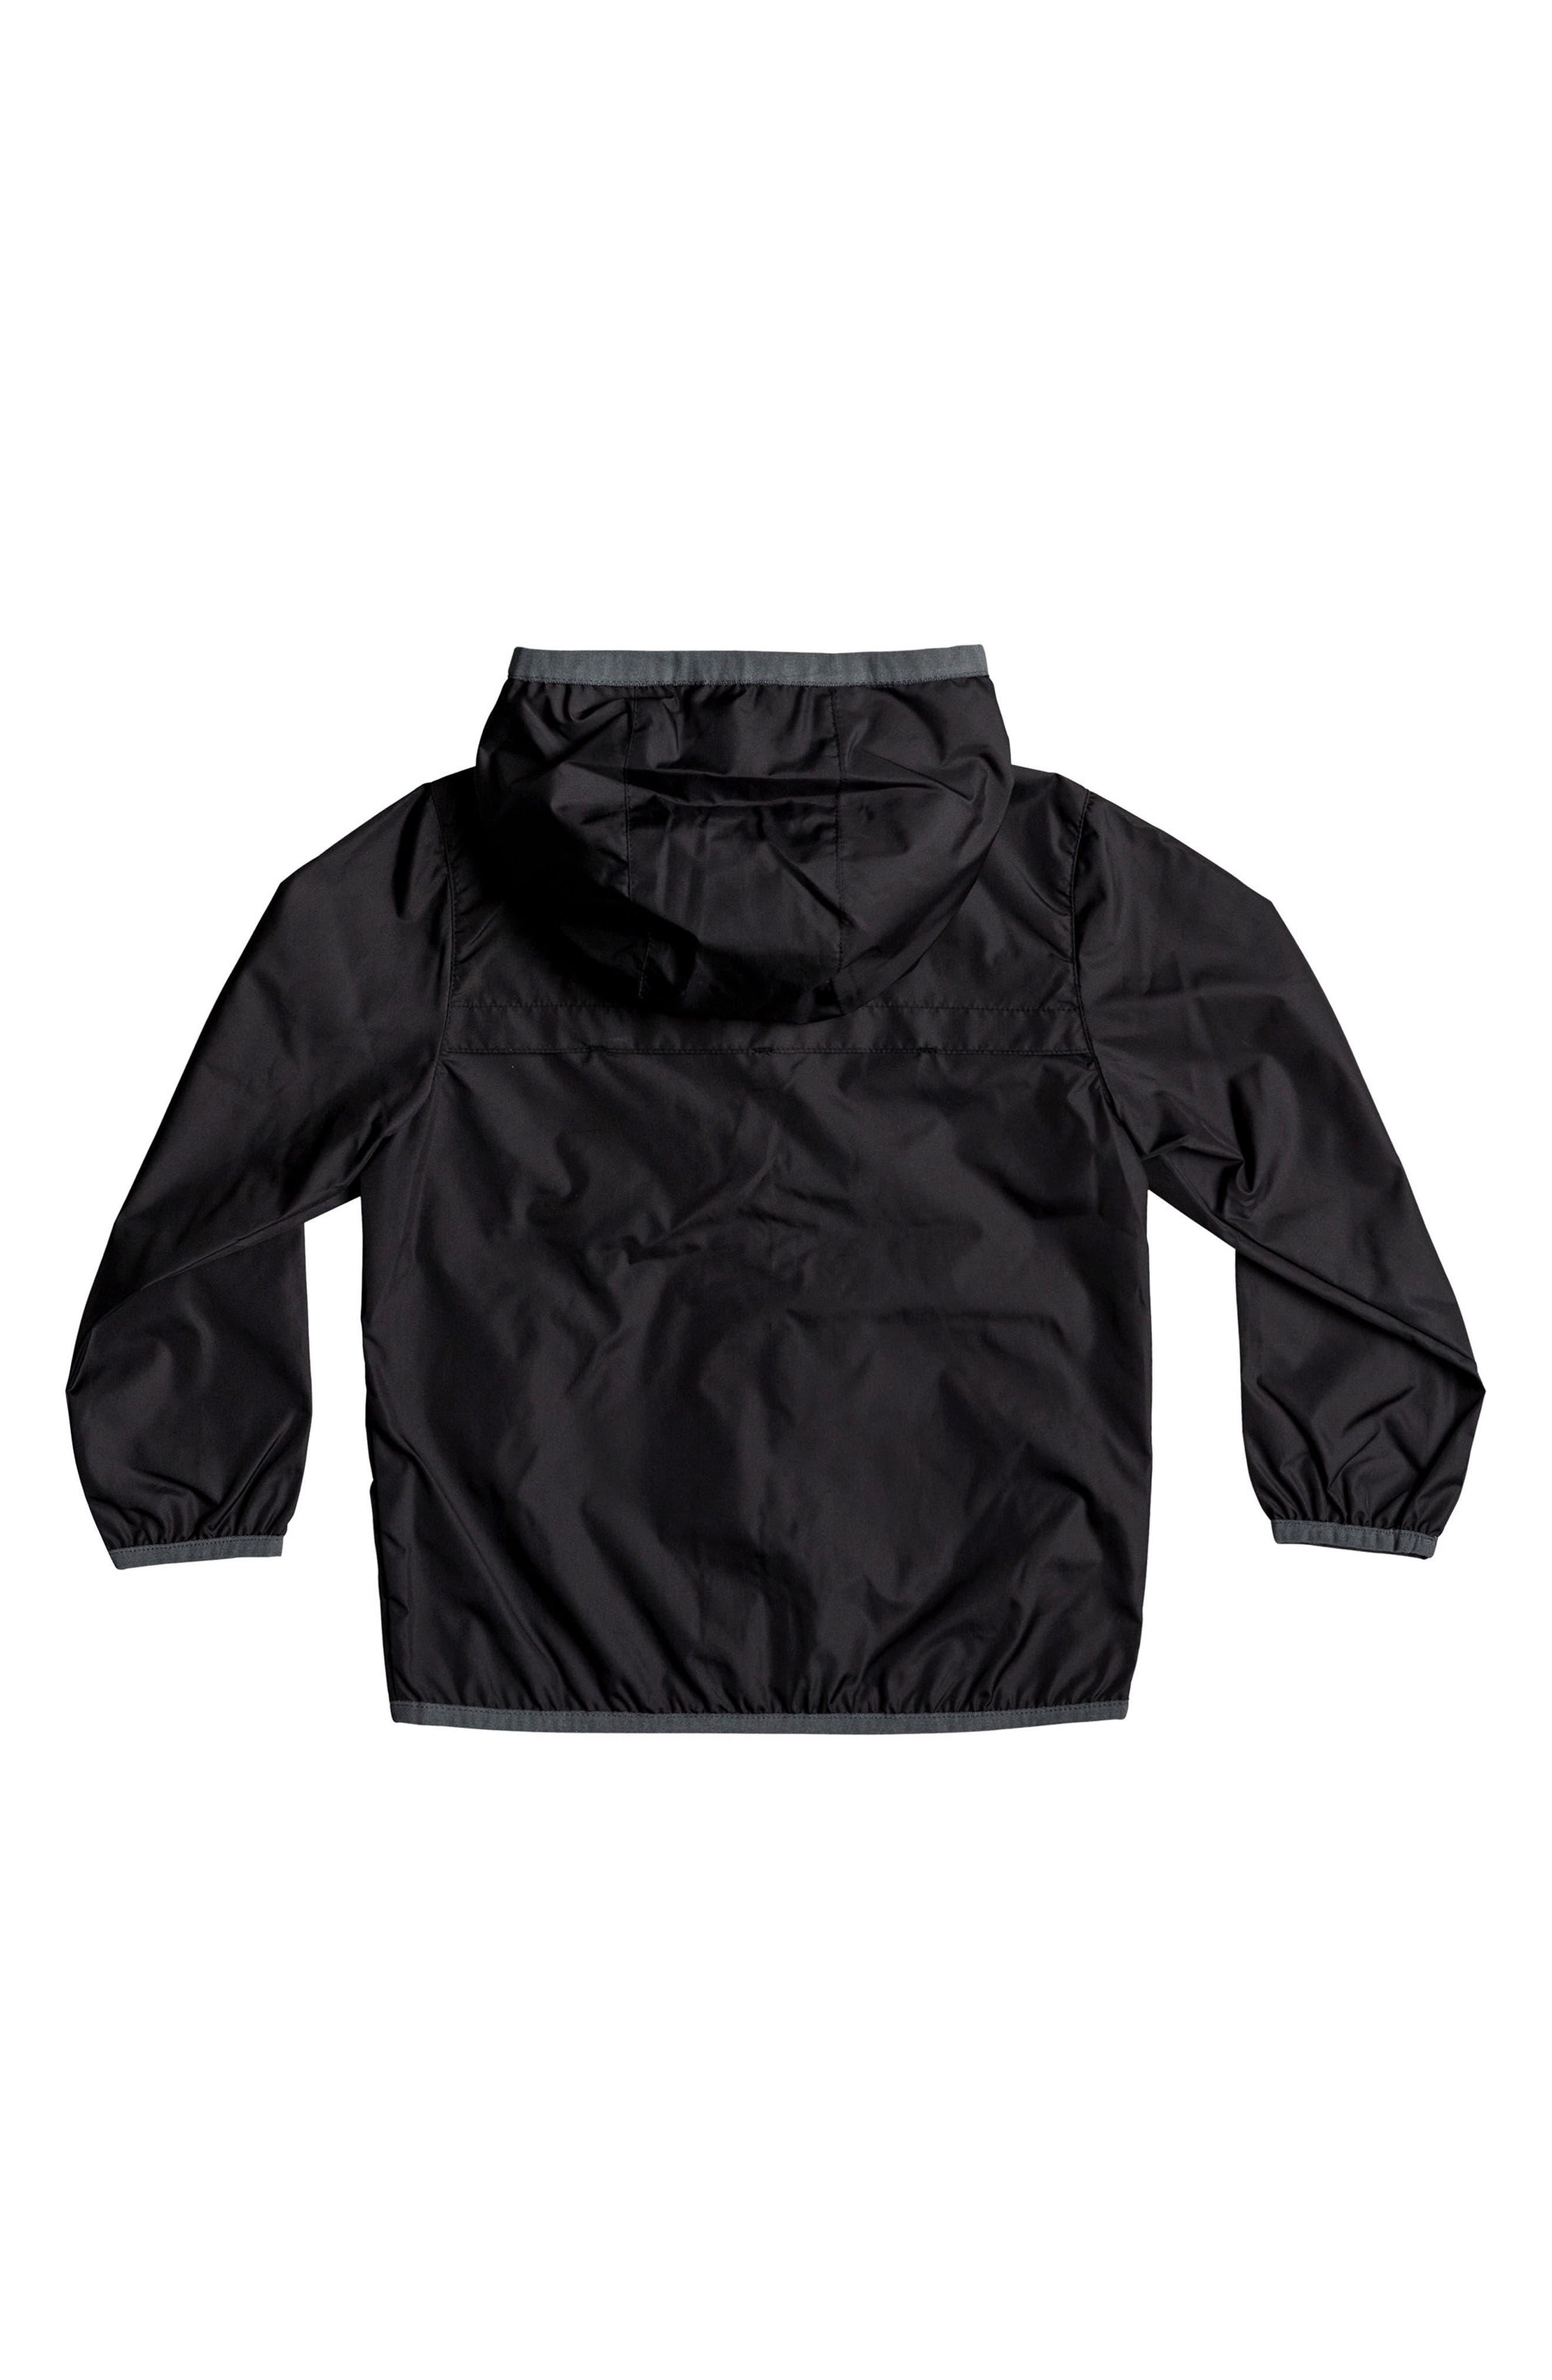 Hooded Jacket,                             Alternate thumbnail 2, color,                             Black